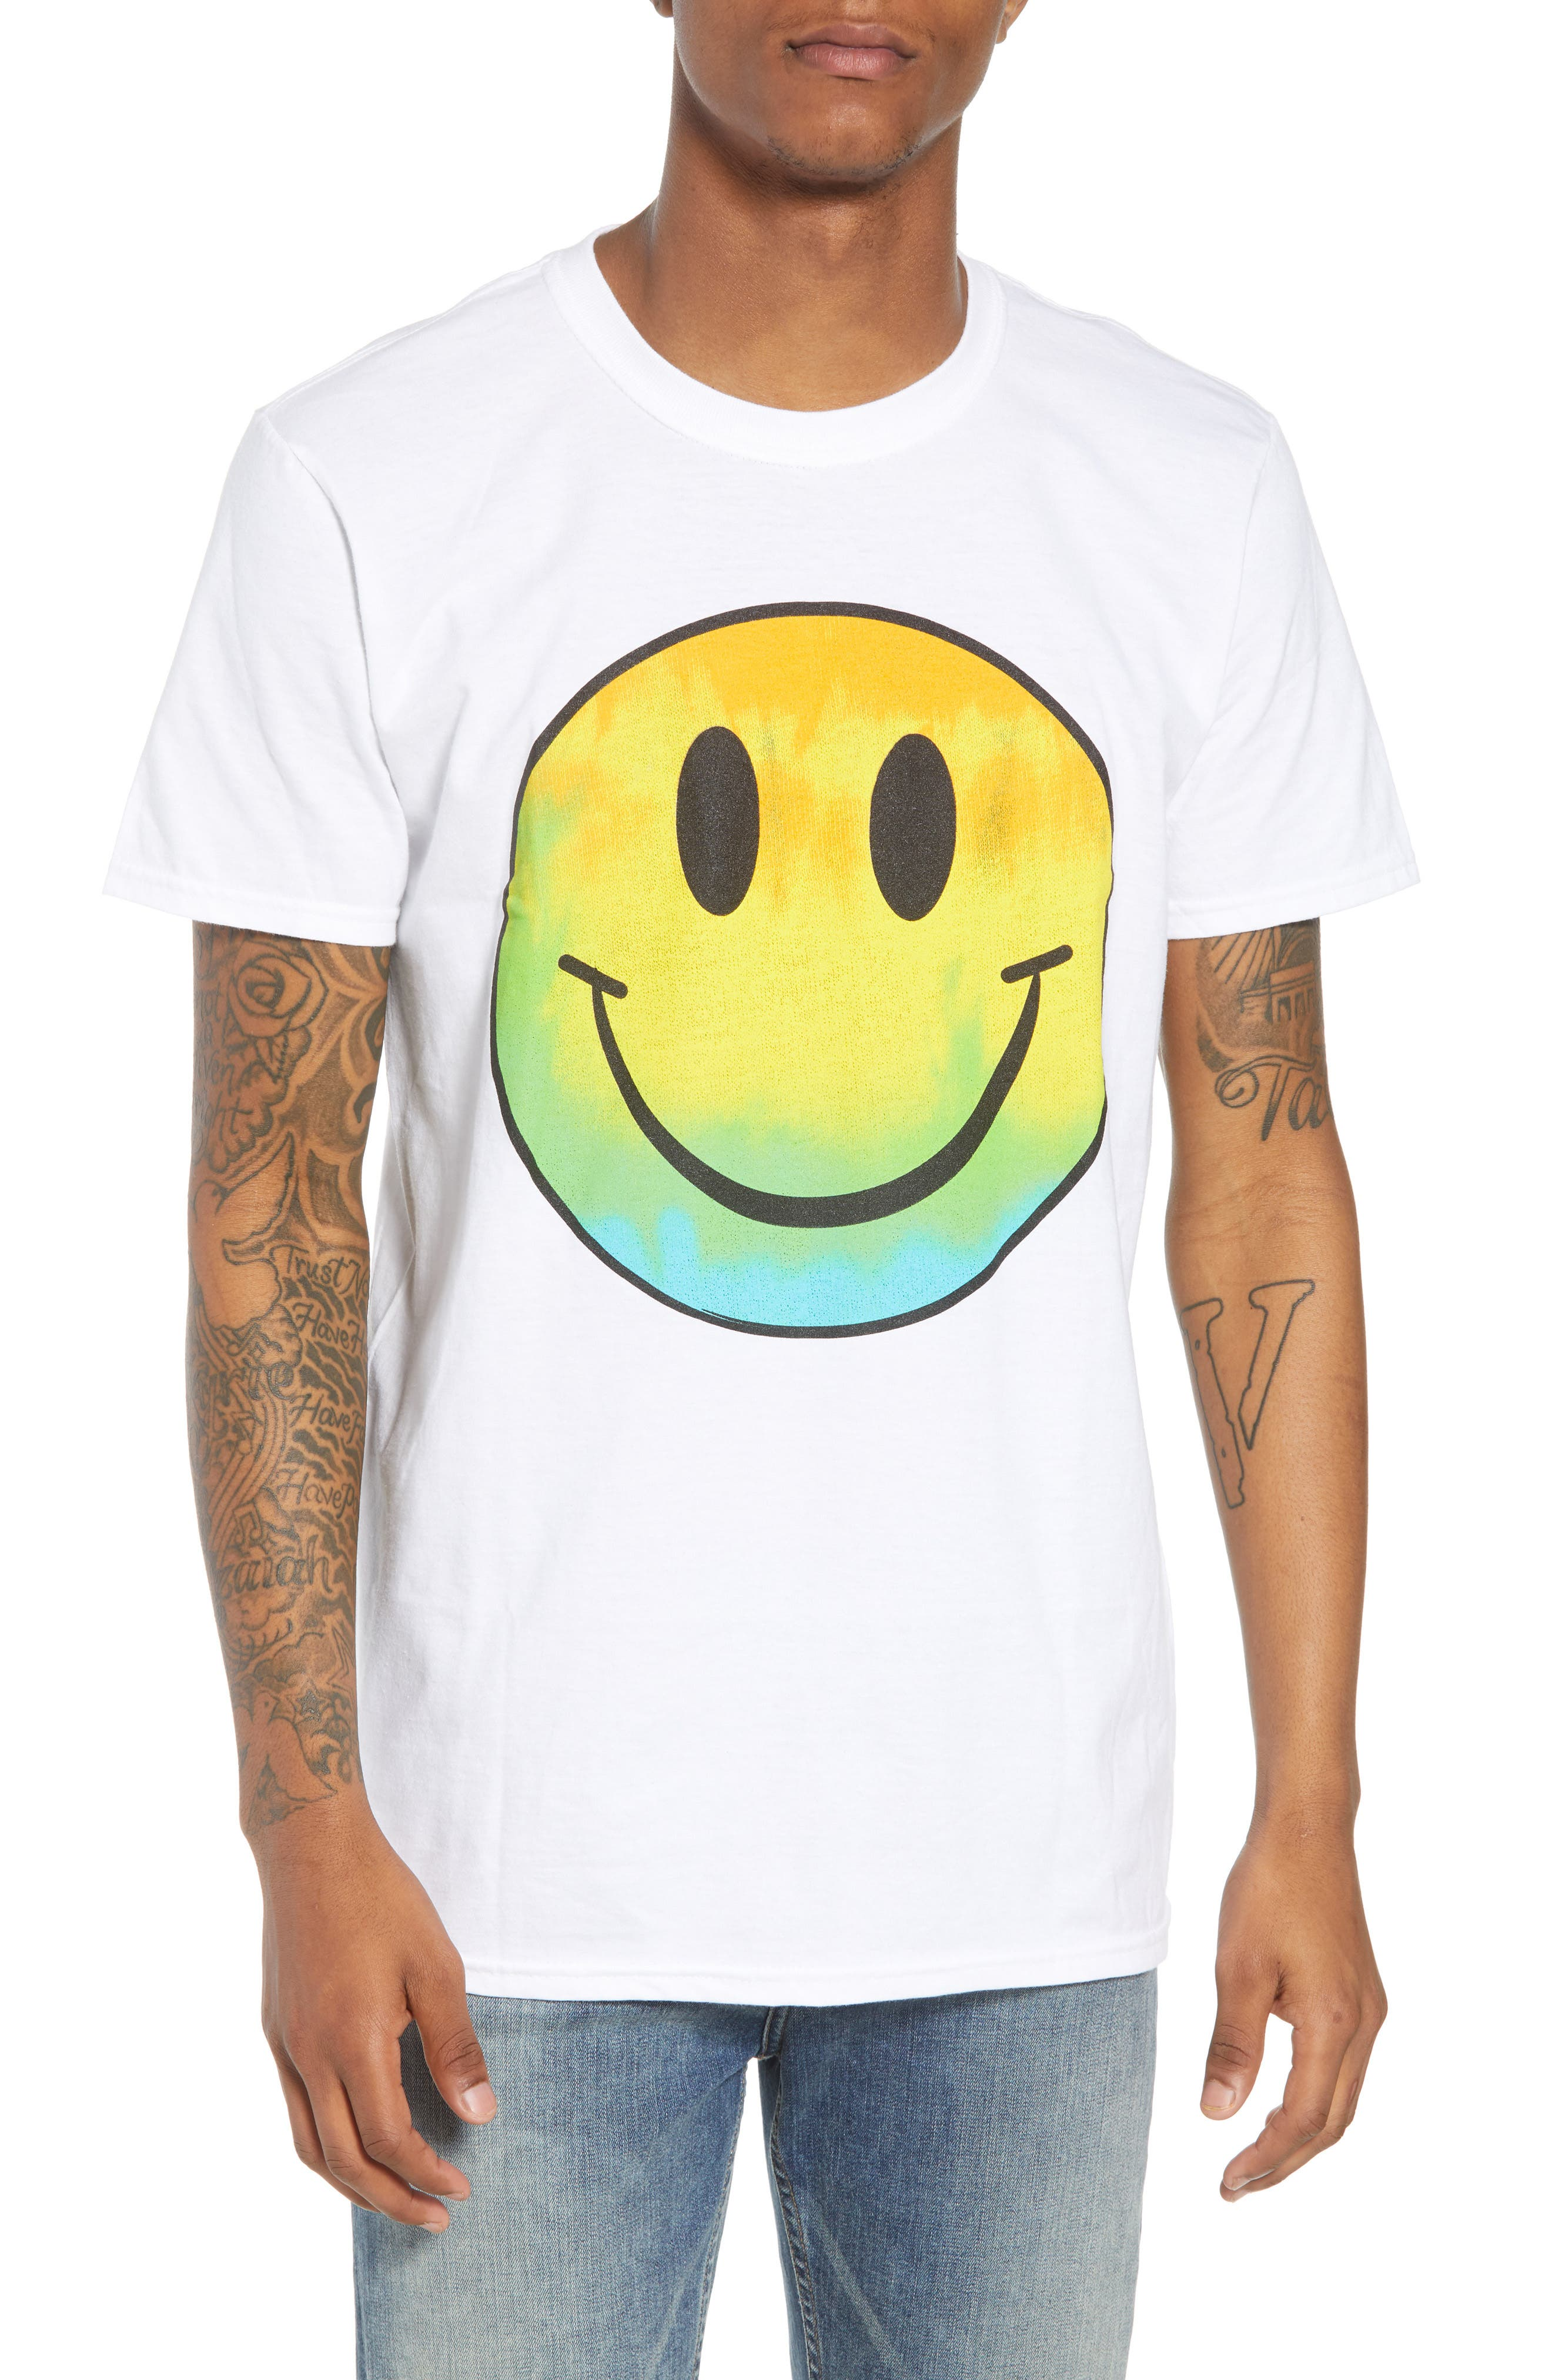 Tie Dye Smiley Face T-Shirt,                             Main thumbnail 1, color,                             White Tie Dye Smiley Face